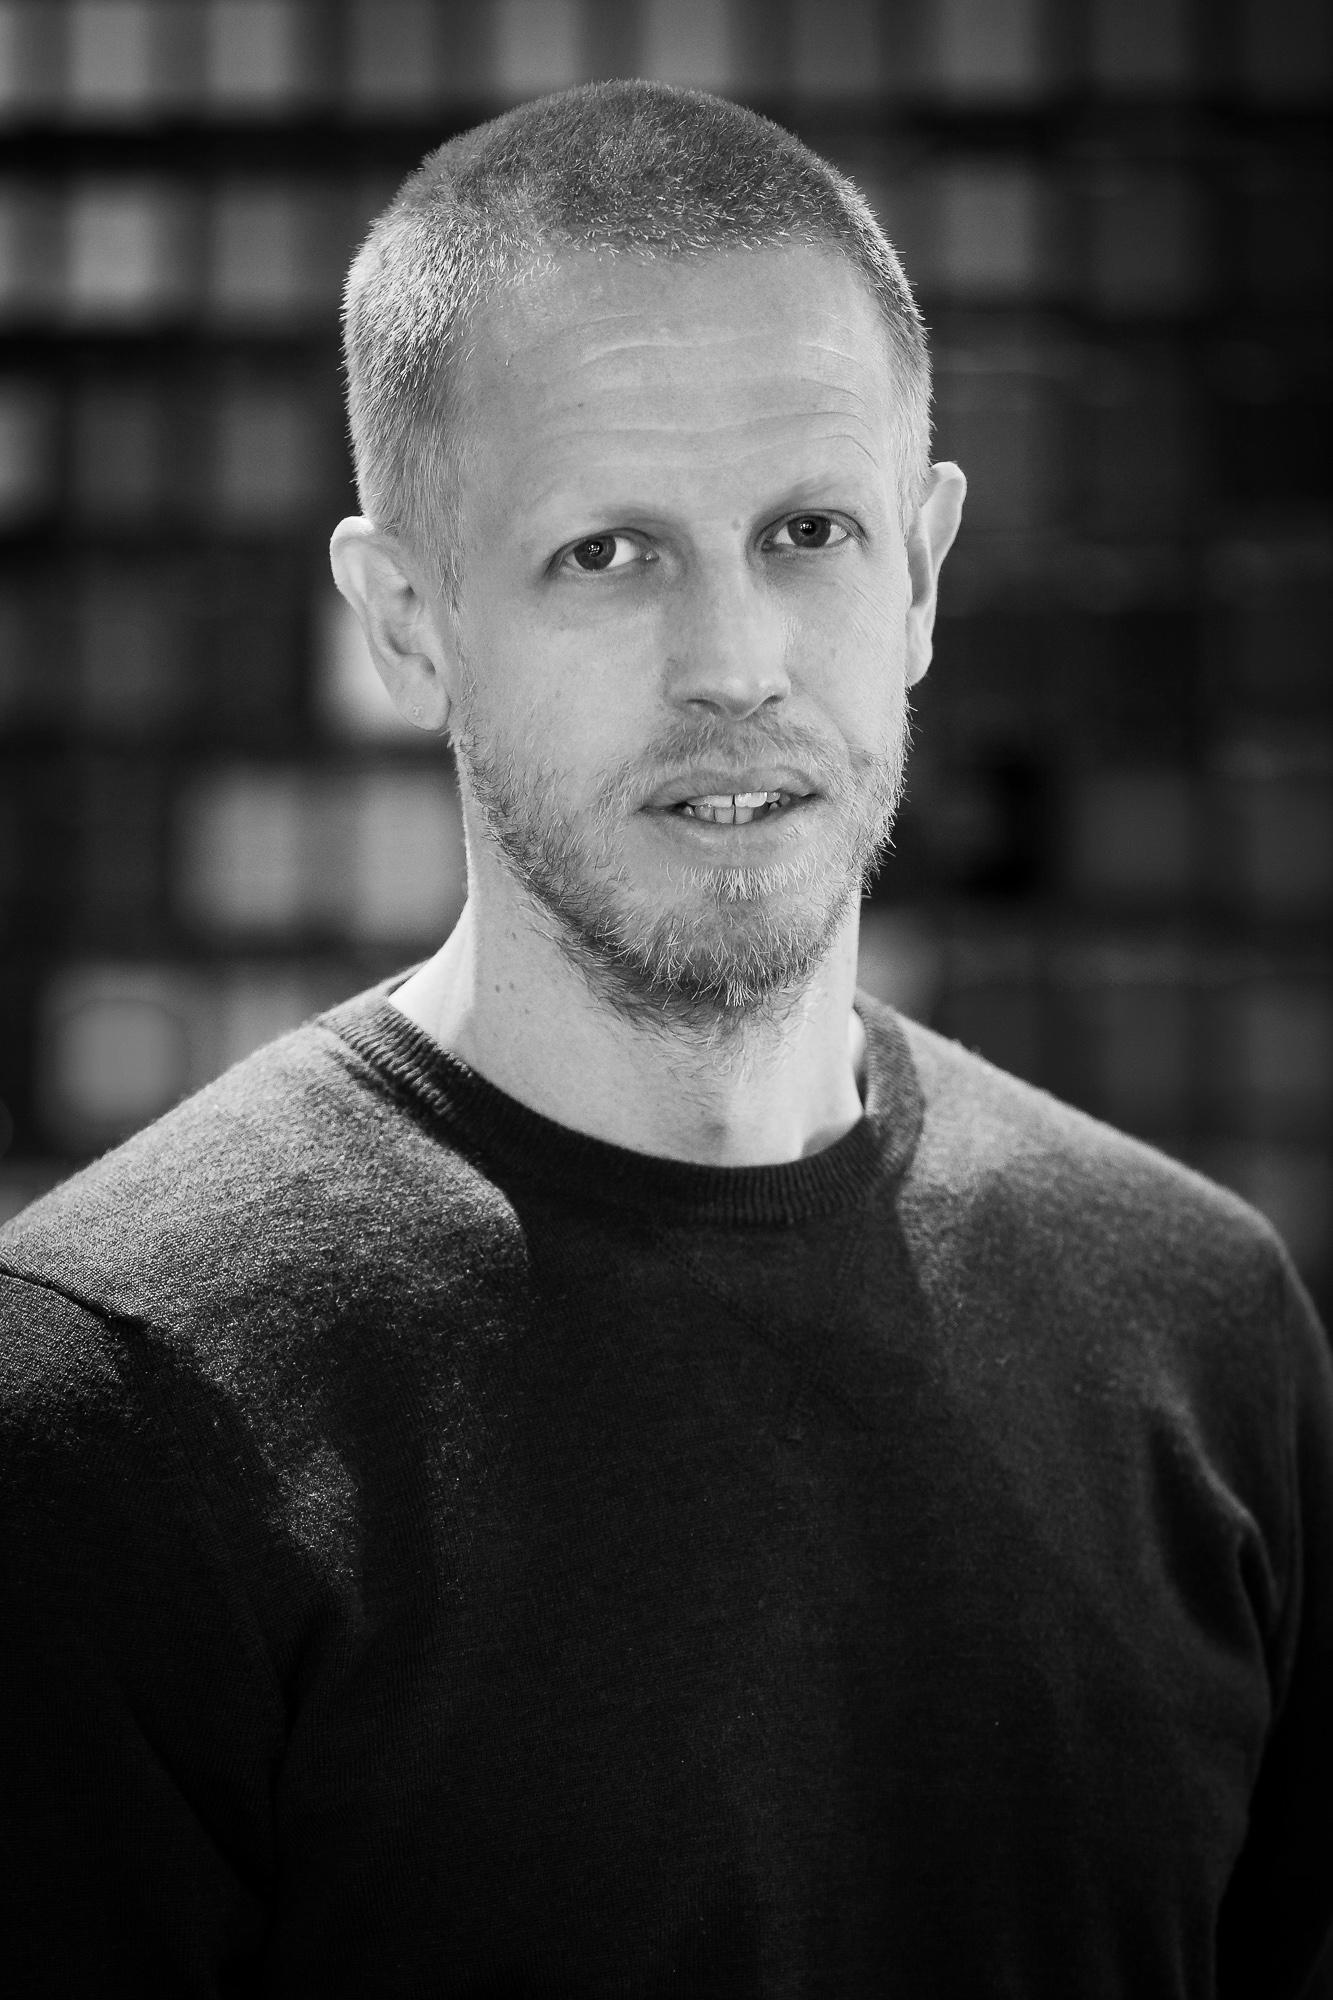 Mattias Högman Brandén